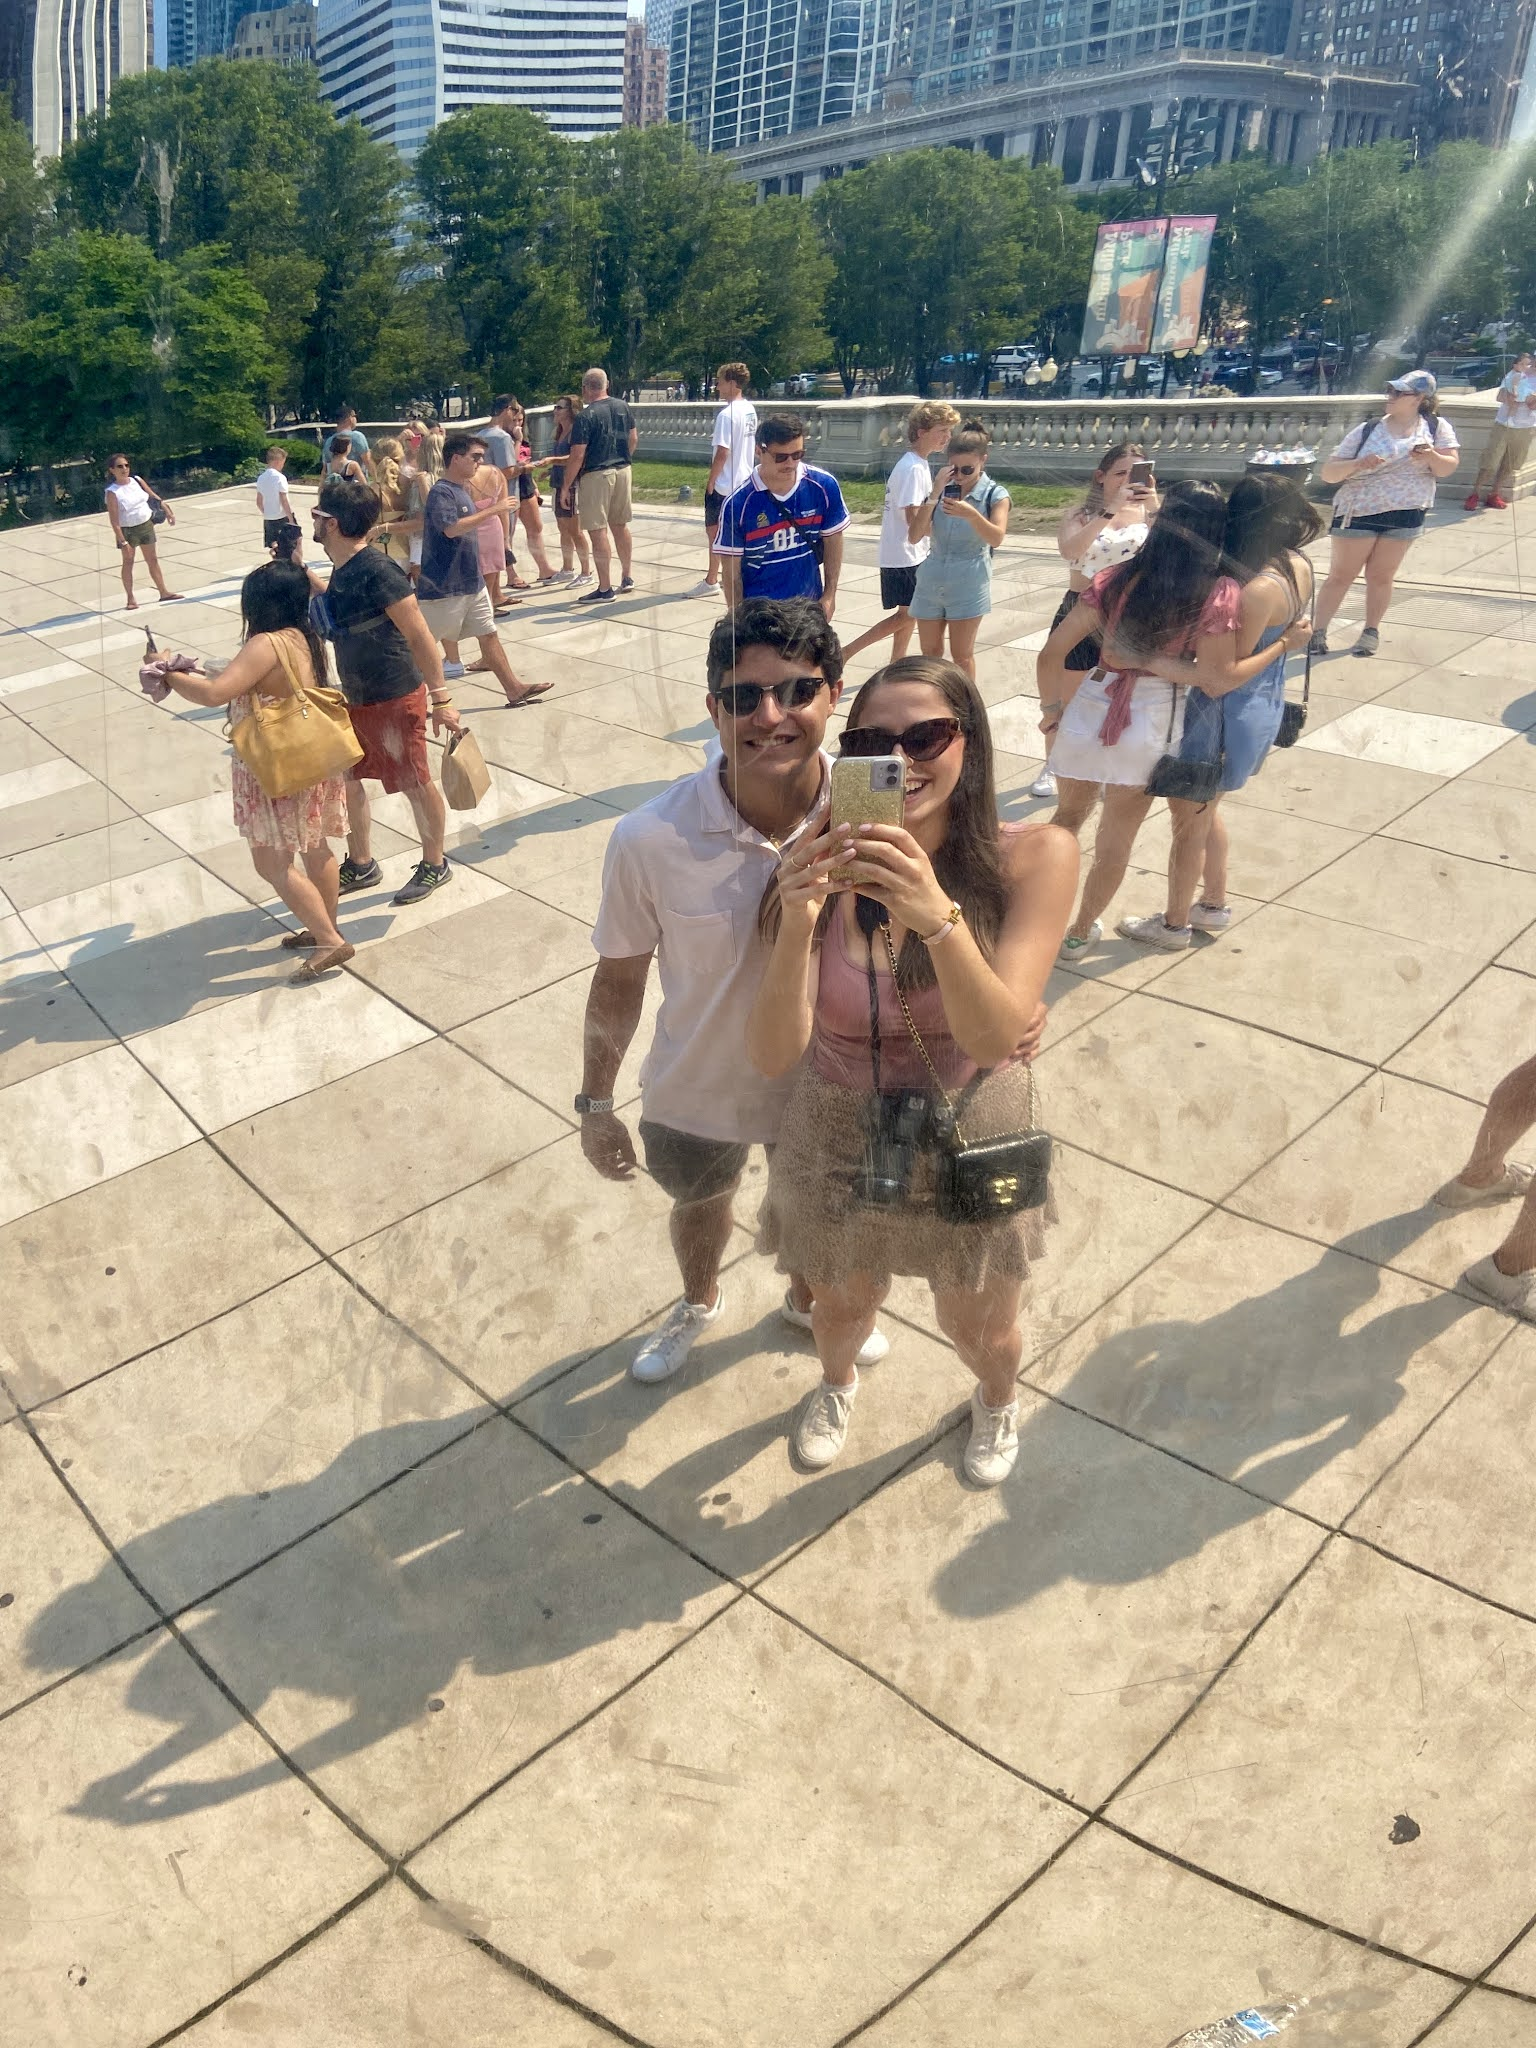 chicago illinois bean, explore chicago, chicago travel guide, summer in Chicago